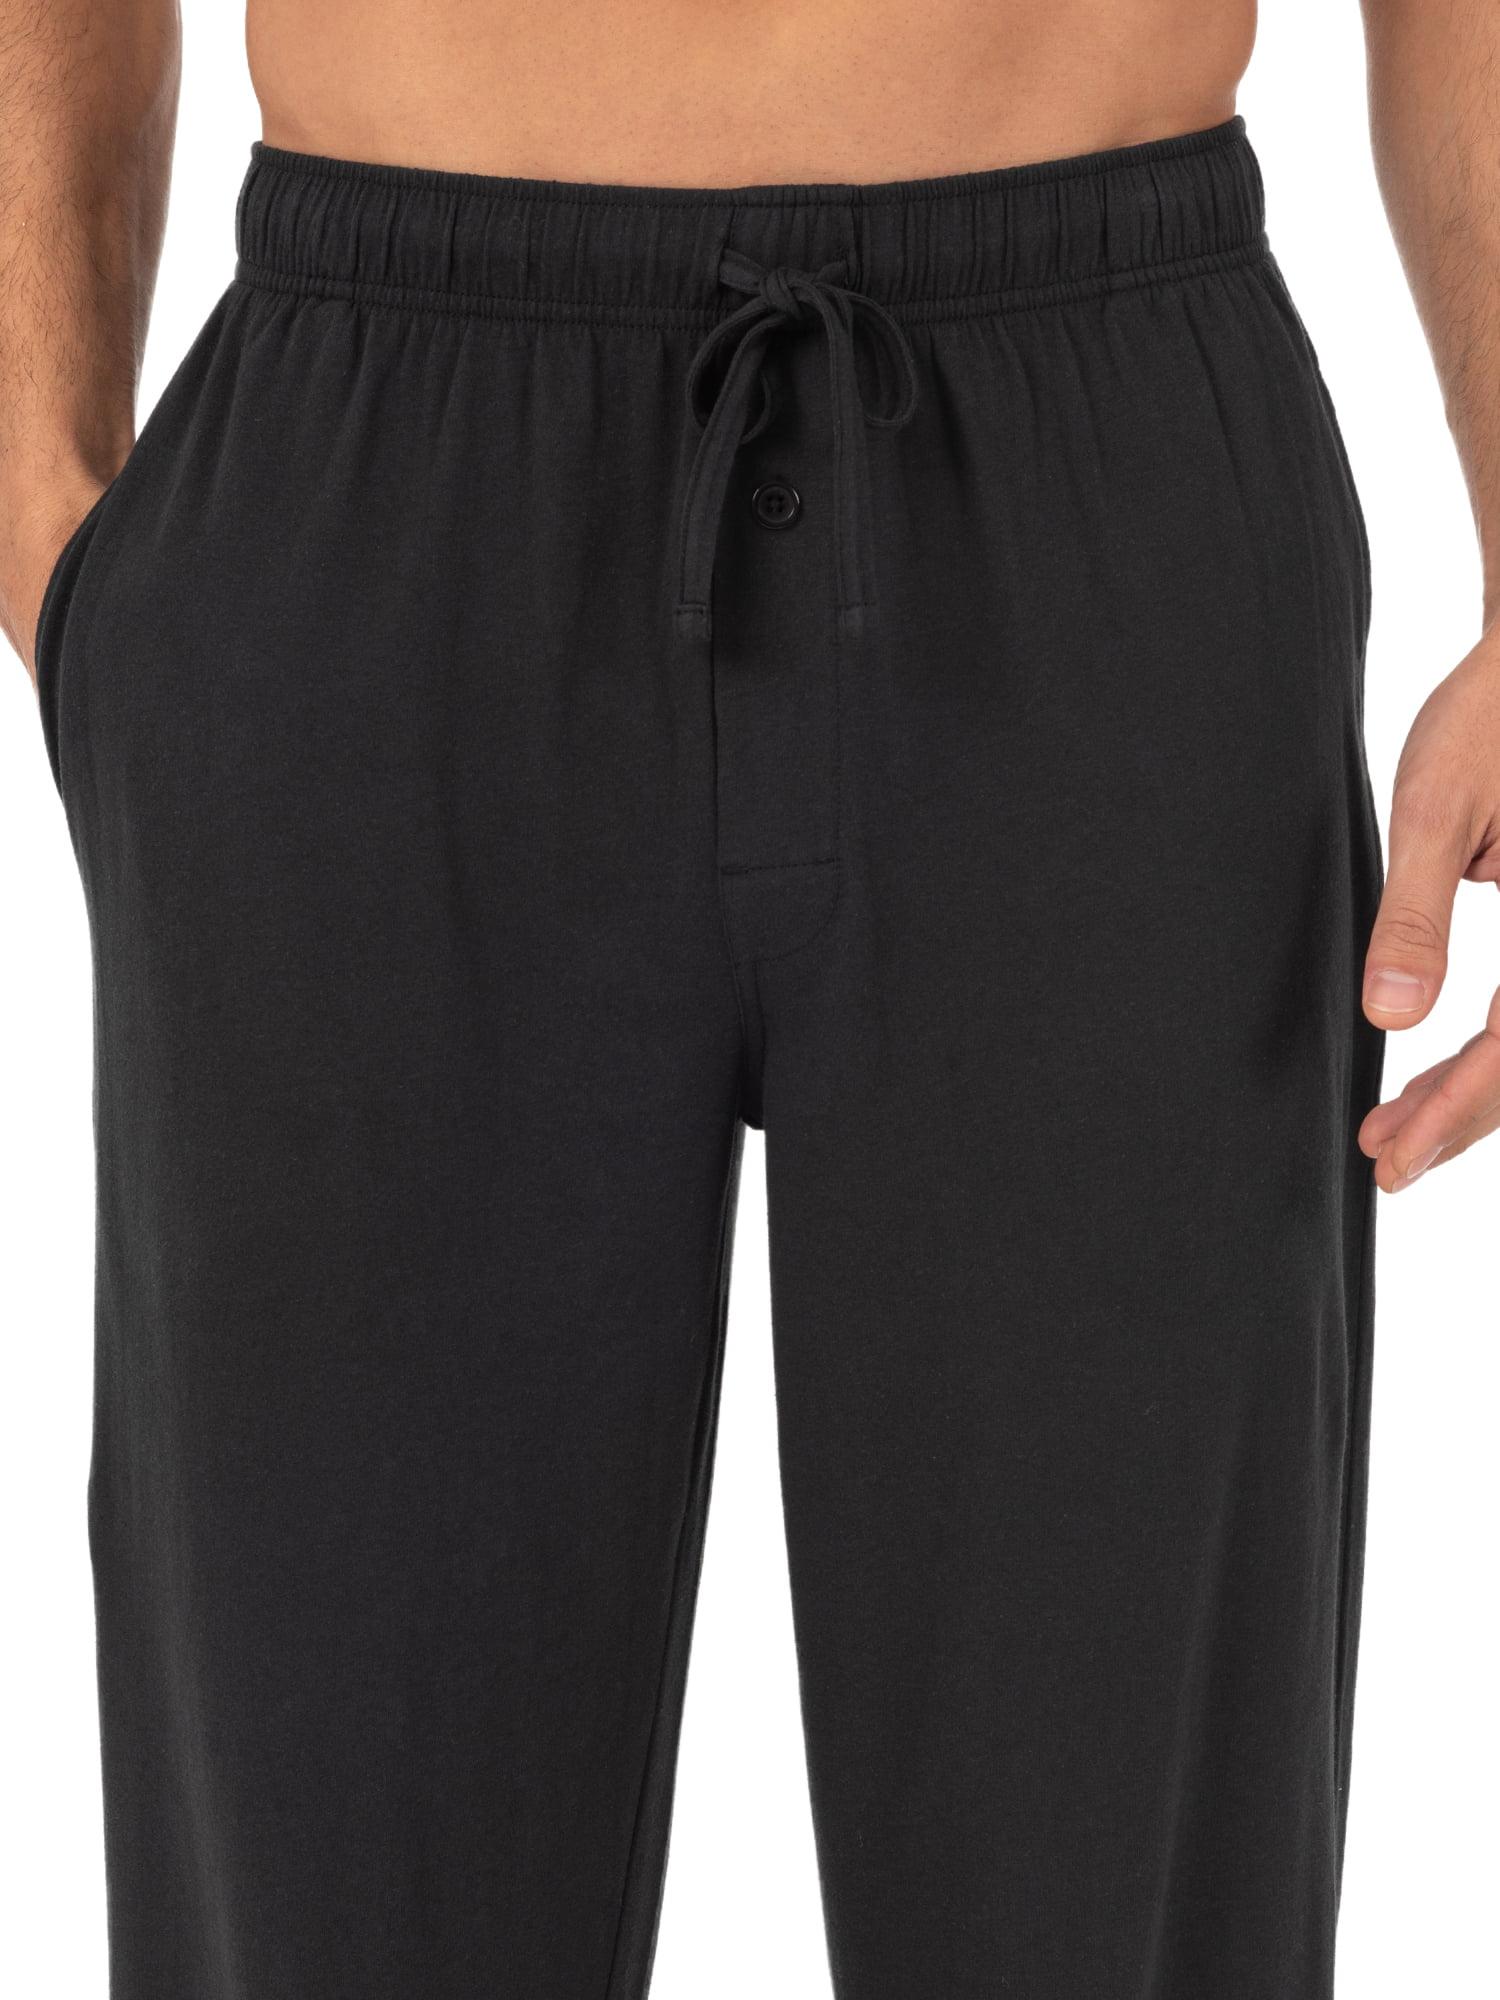 Men Casual Gym Sports Running Shorts Pants Trousers Beach Zipper Pocket D237